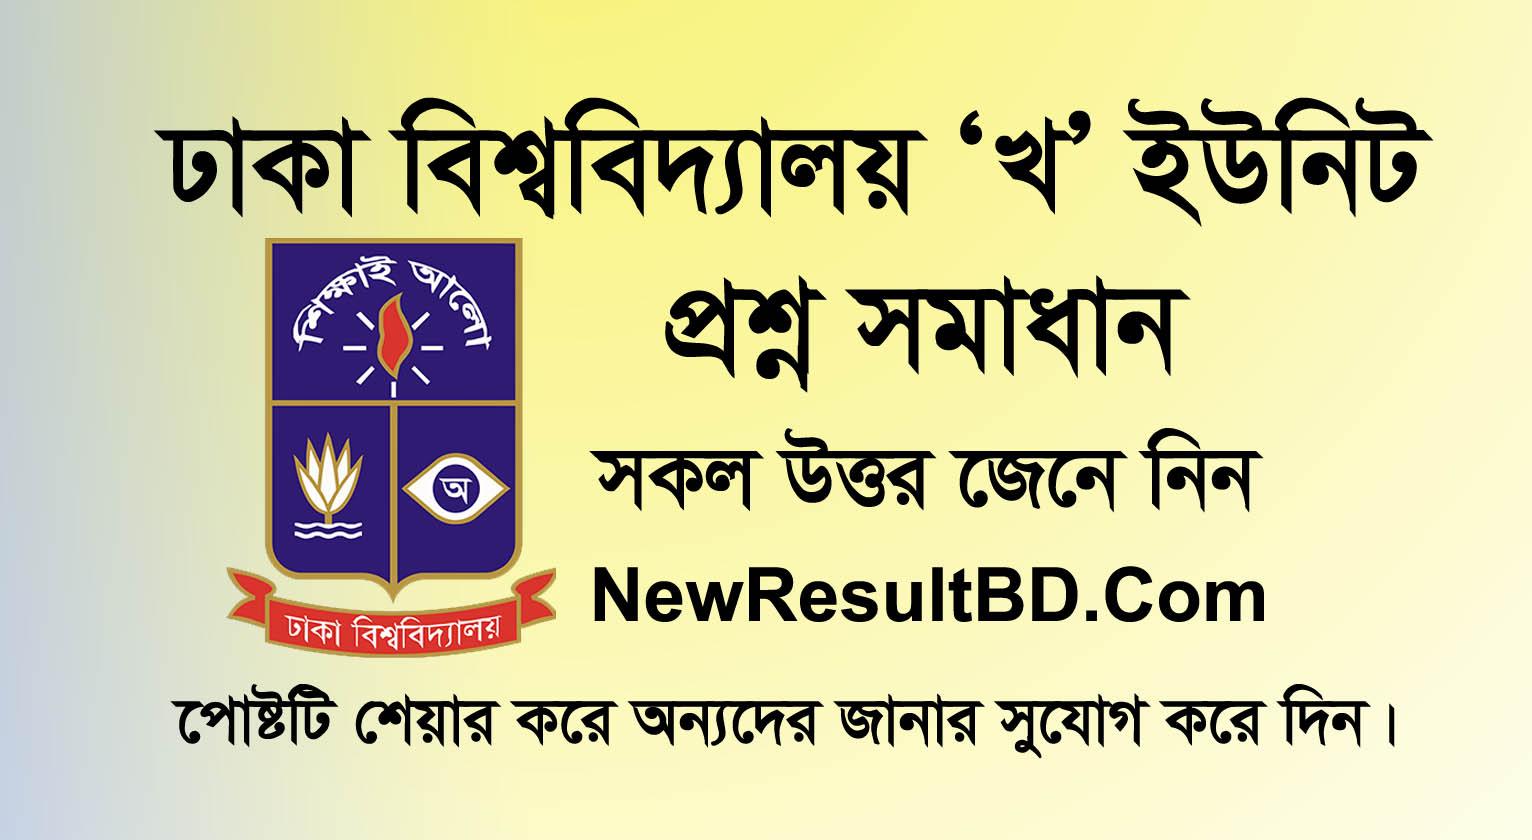 Dhaka University B Unit Question Solution 2019-20, 2020-21, DU B Unit Question Solve, Kha unit solutions, বি ইউনিট প্রশ্ন সমাধান ২০১৯, Dhaka Varsity B Unit Answers.